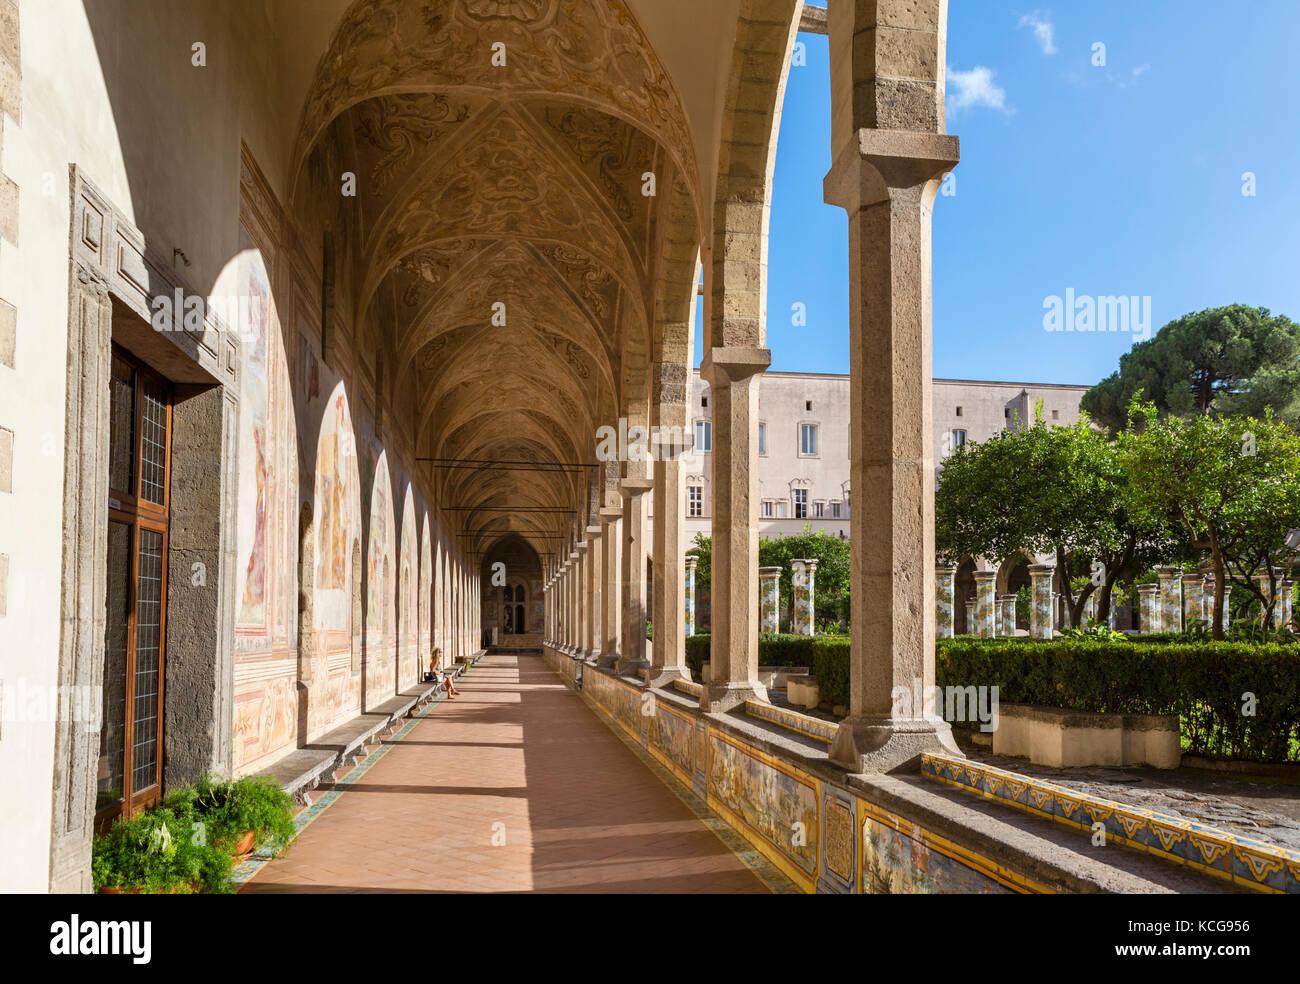 The Cloister of Santa Chiara (Chiostro di Santa Chiara), Convent of Santa Chiara, Naples, Italy - Stock Image